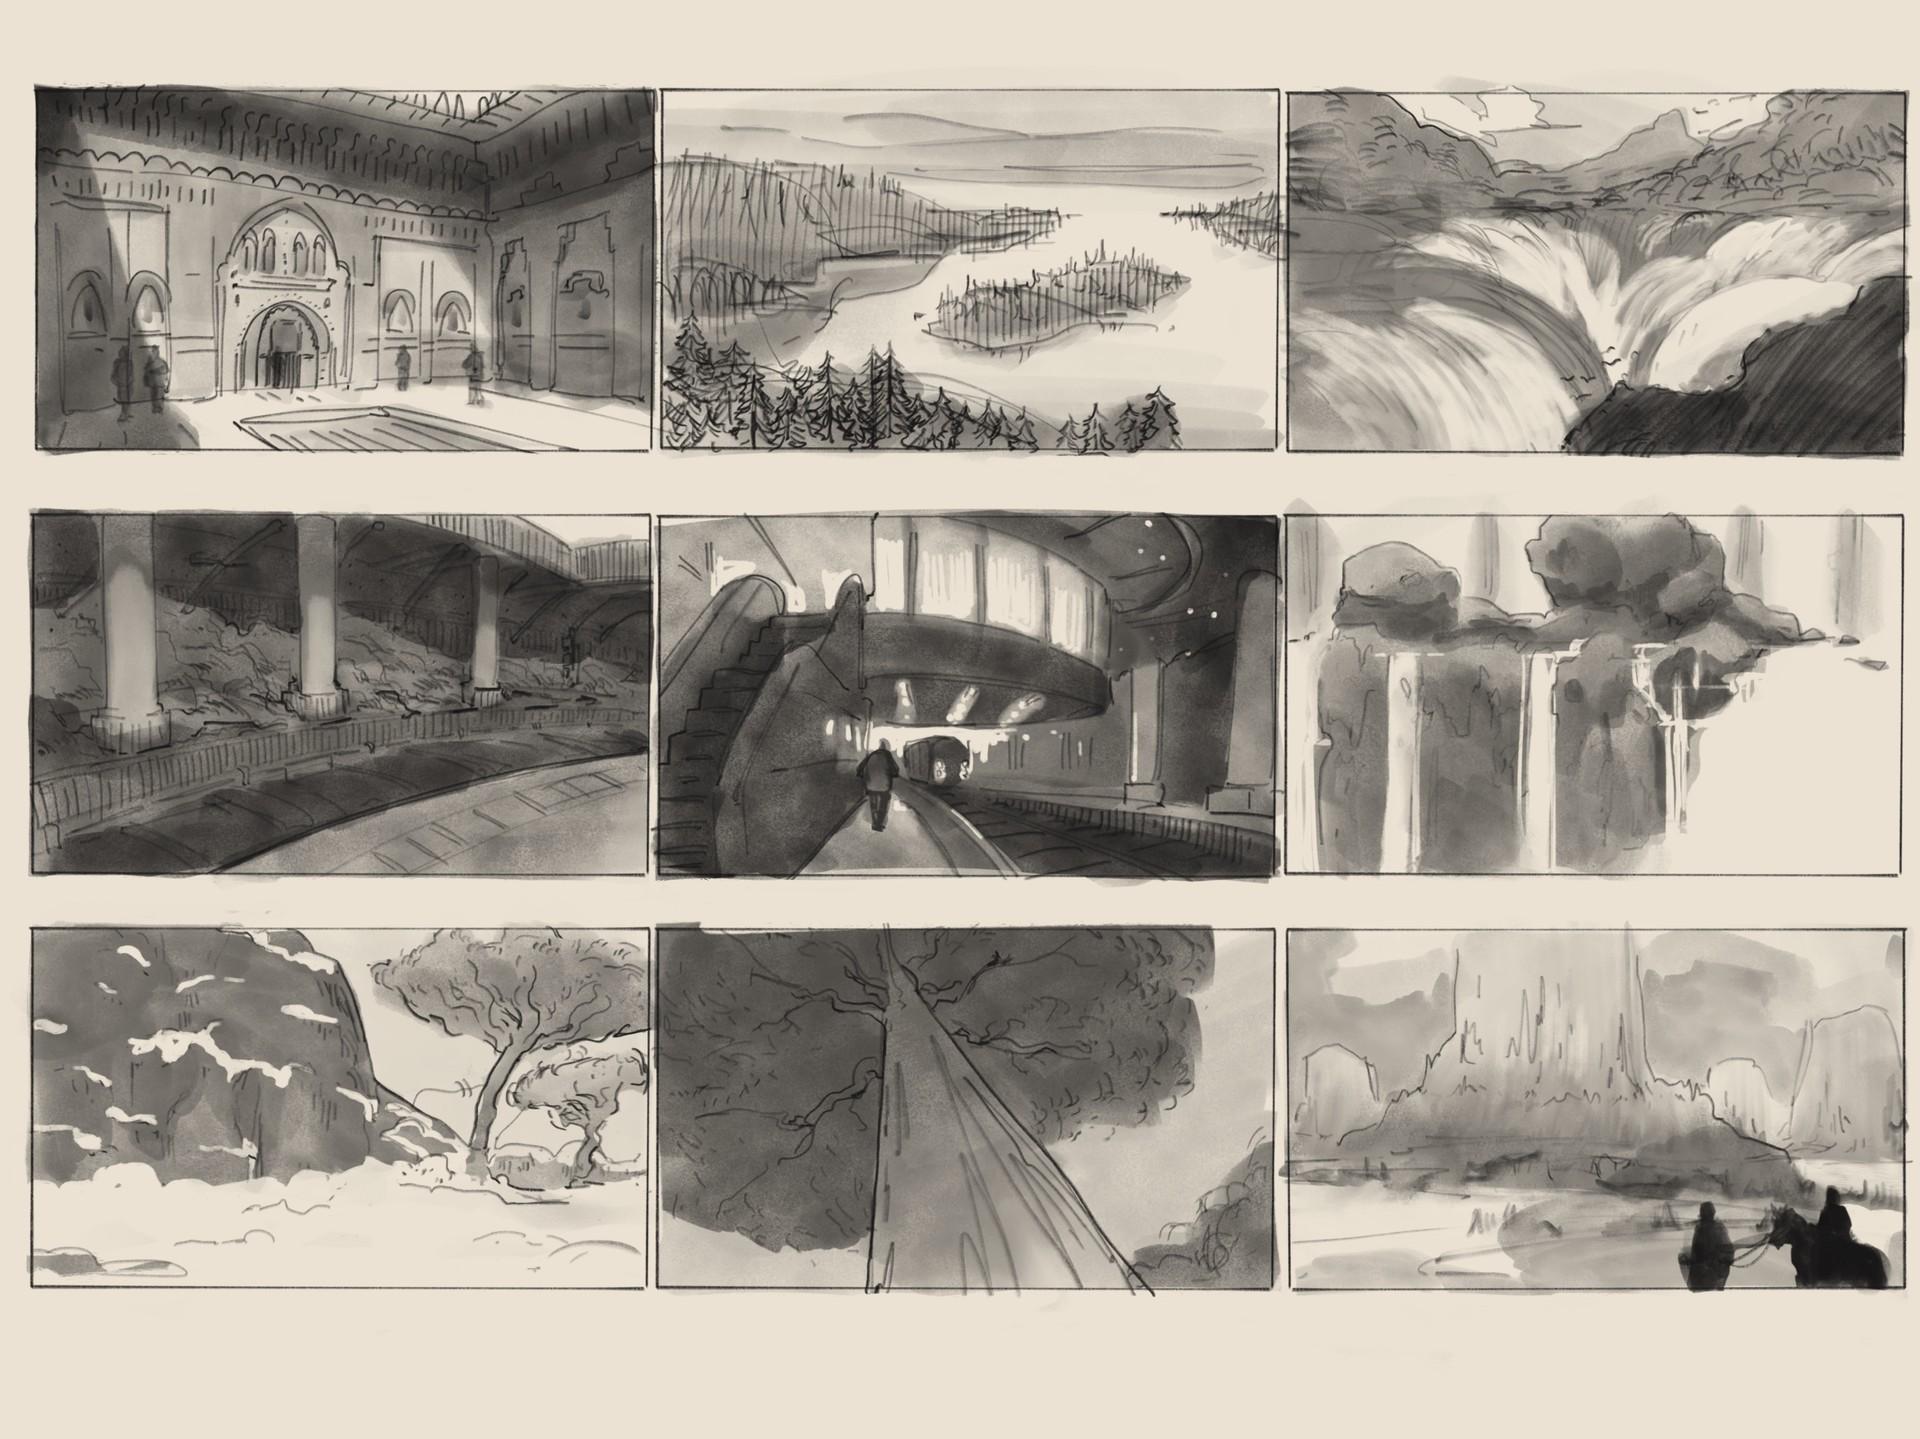 Sample of some enviro thumbnail sketches.